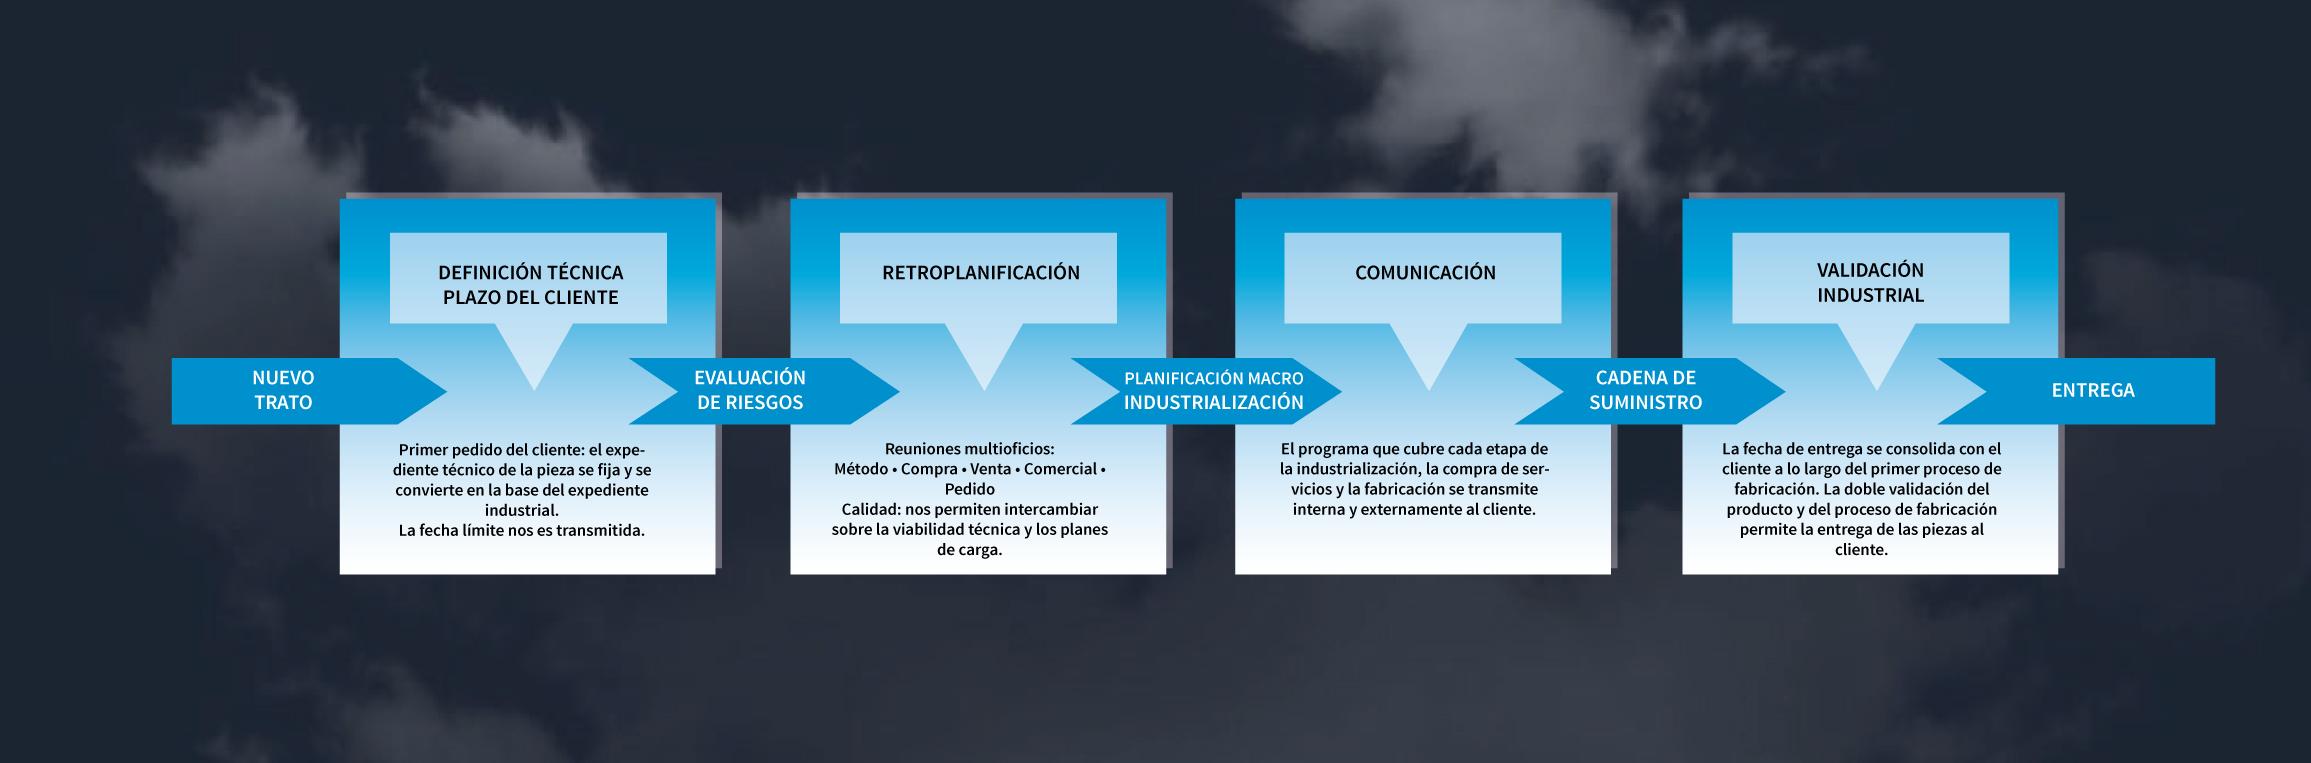 management-echeverria-entreprise-vecto-ES